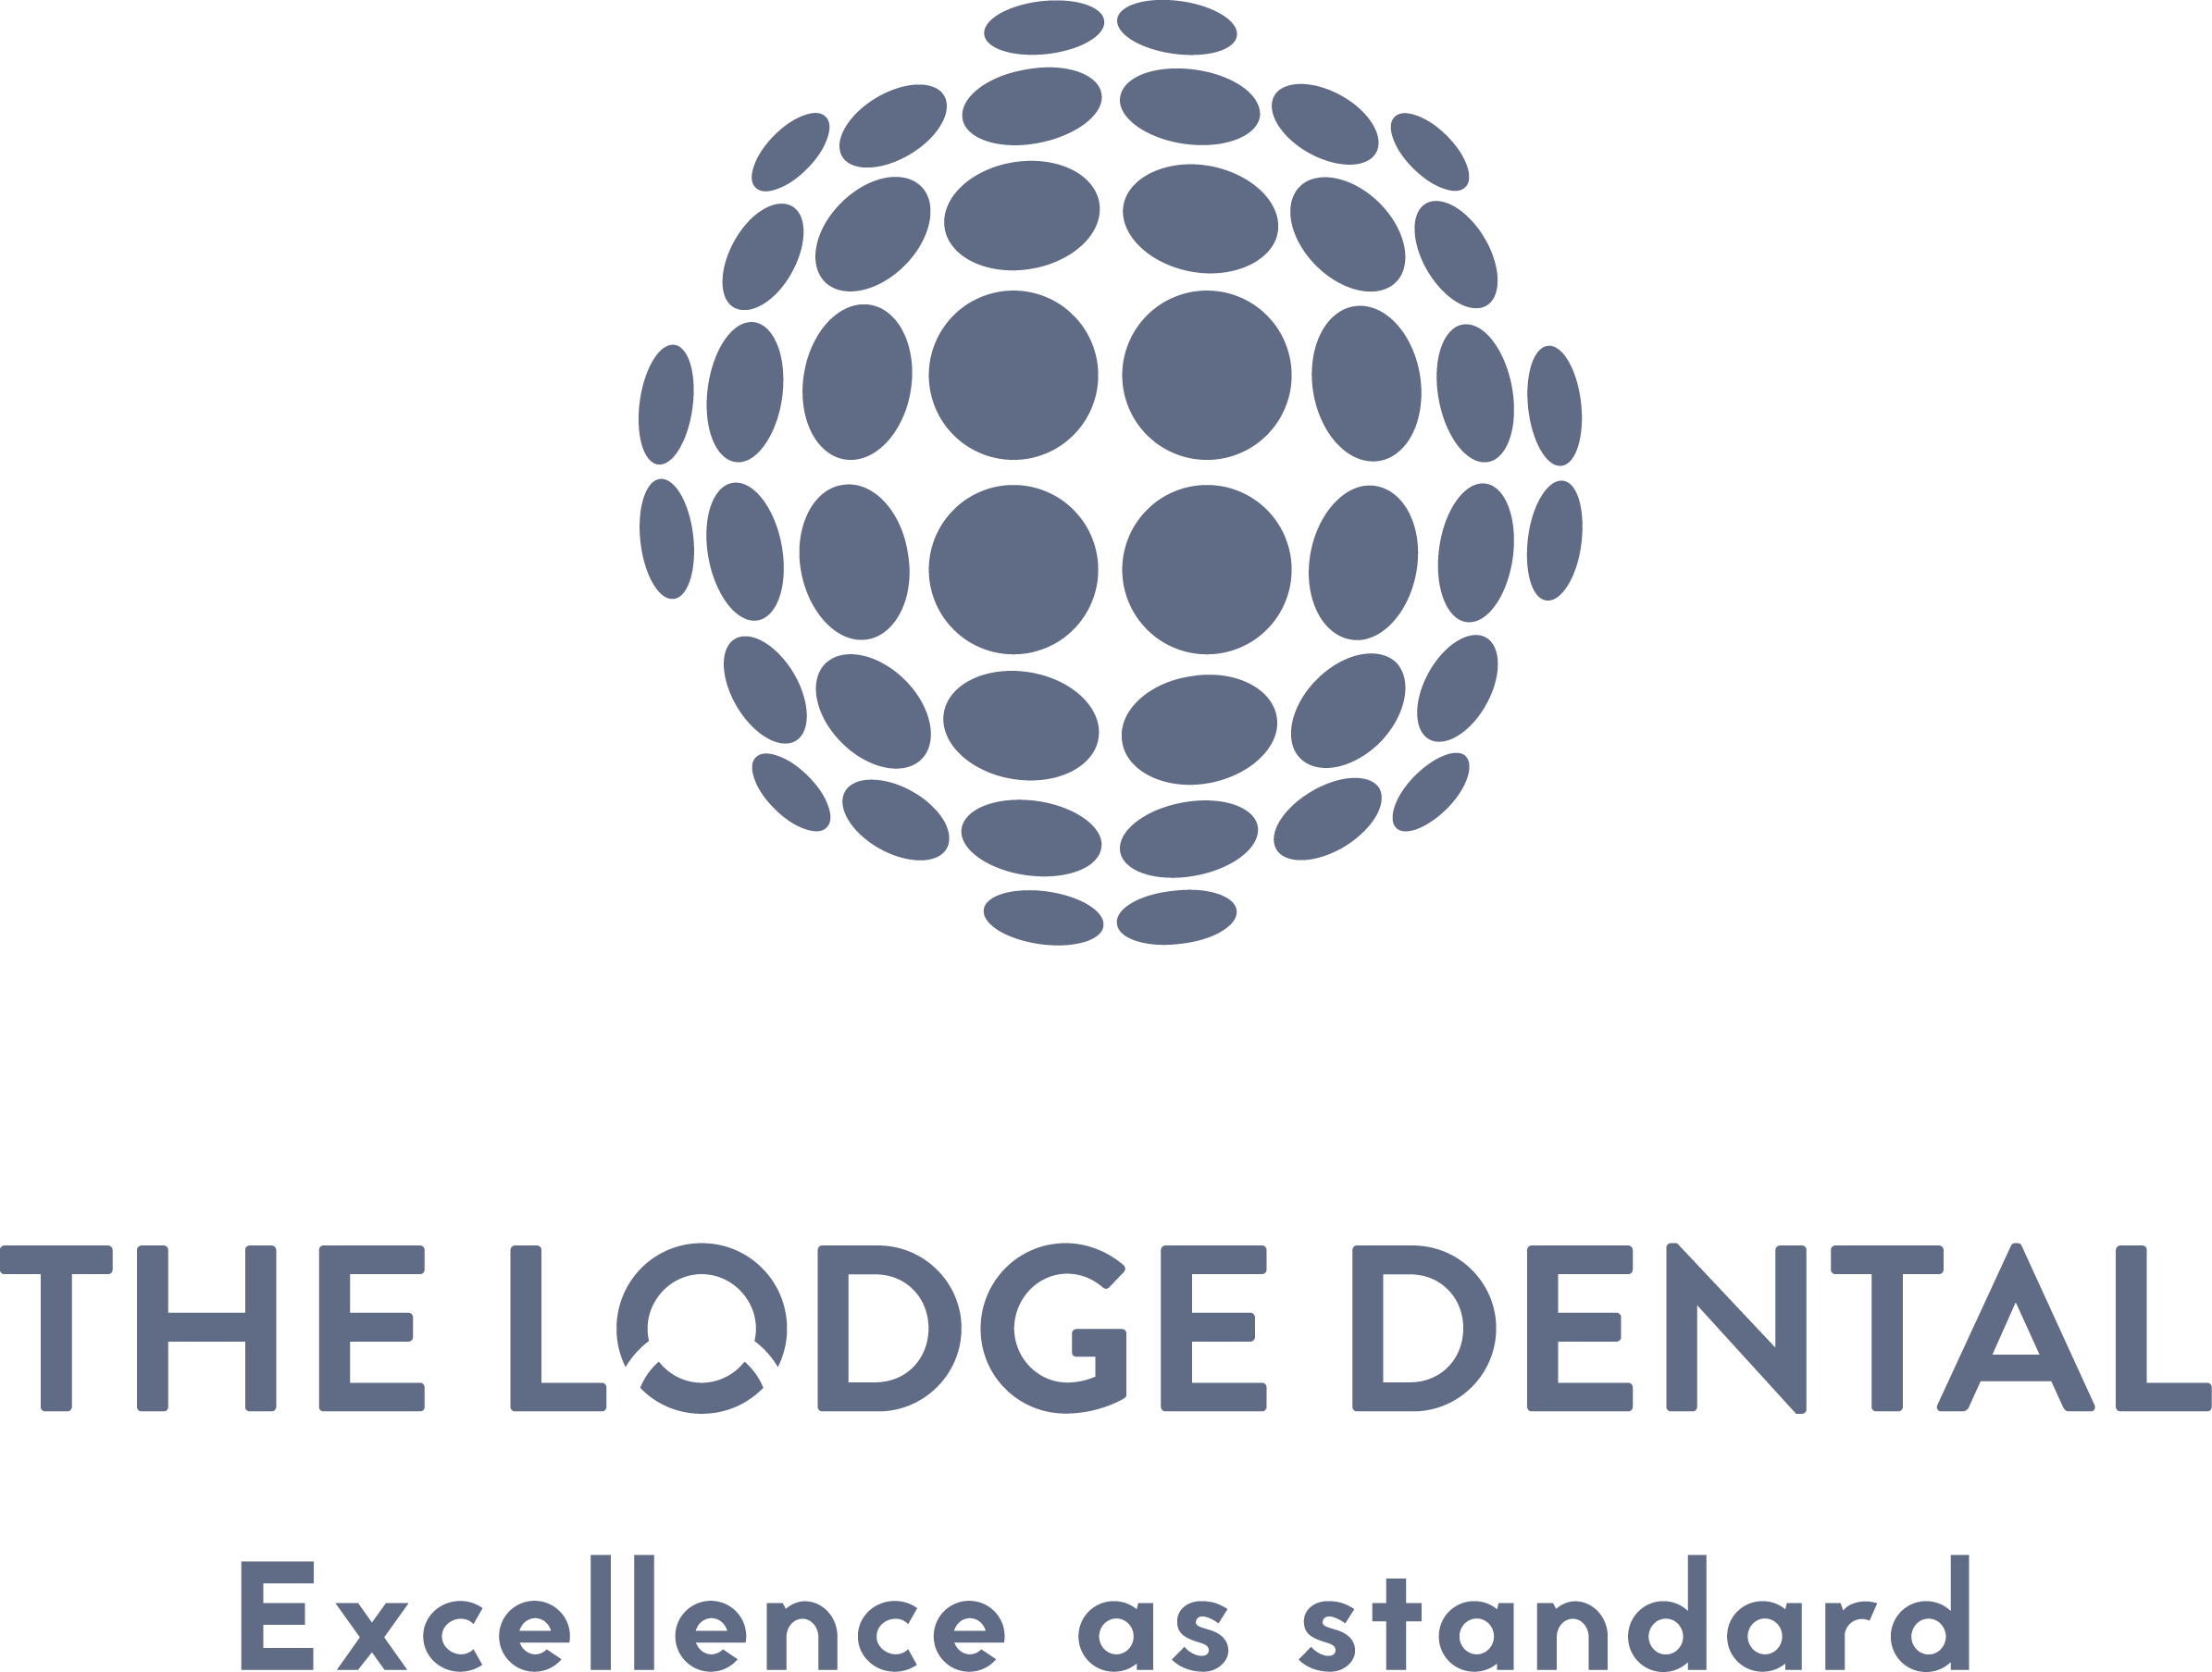 The Lodge Dental Practice